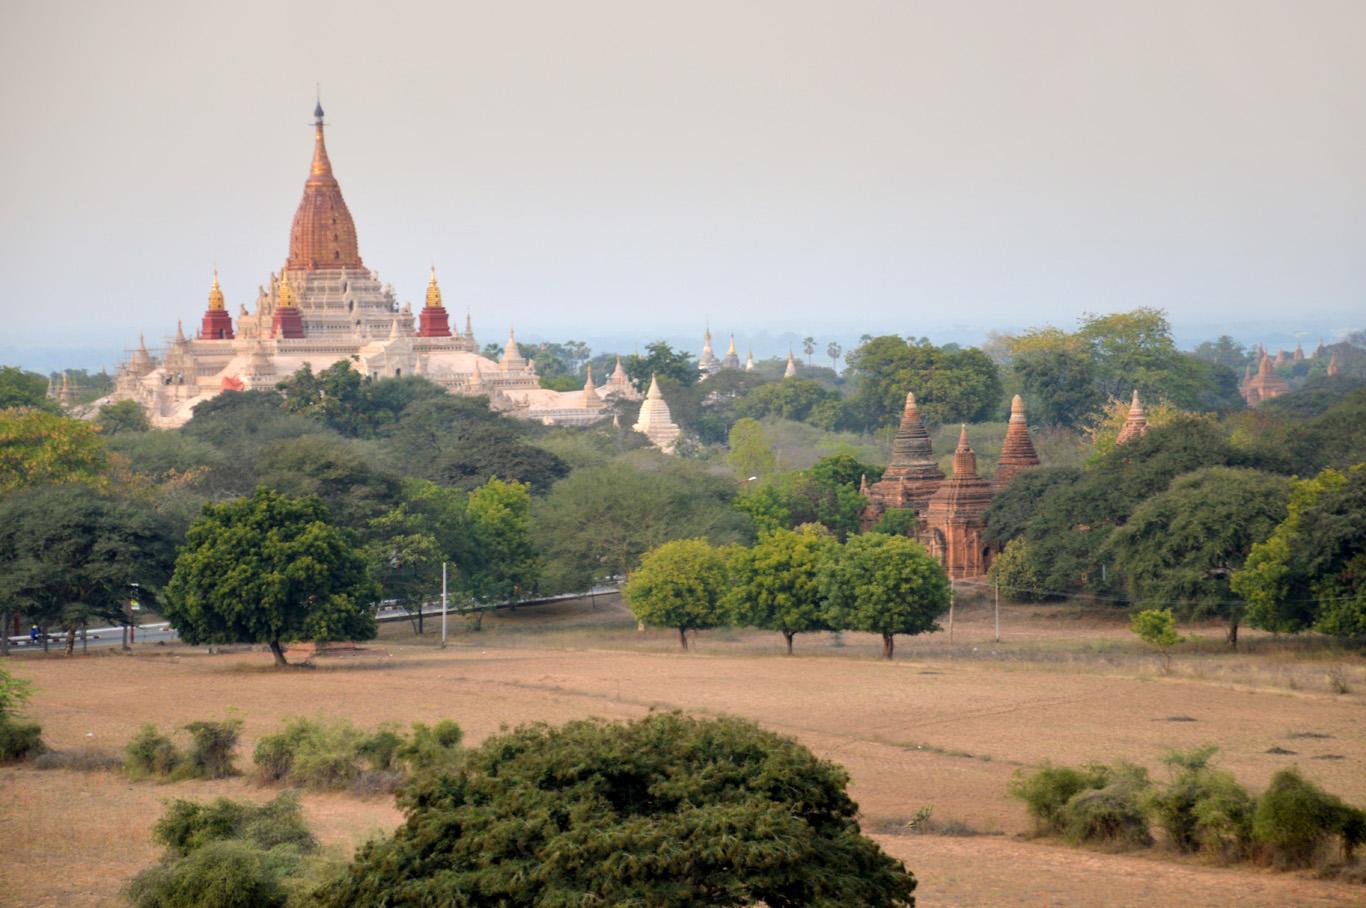 View of Ananda Pagoda